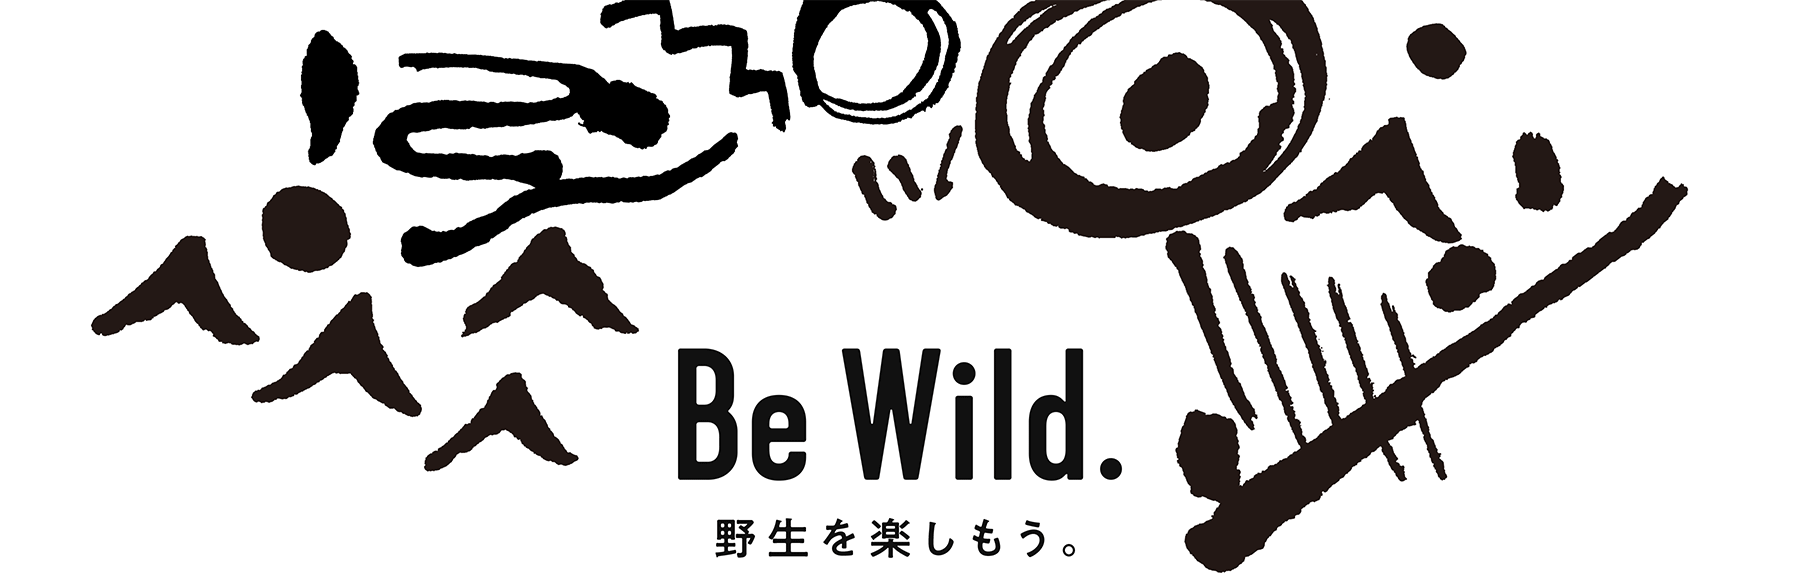 Be Wild. 野生を楽しもう。